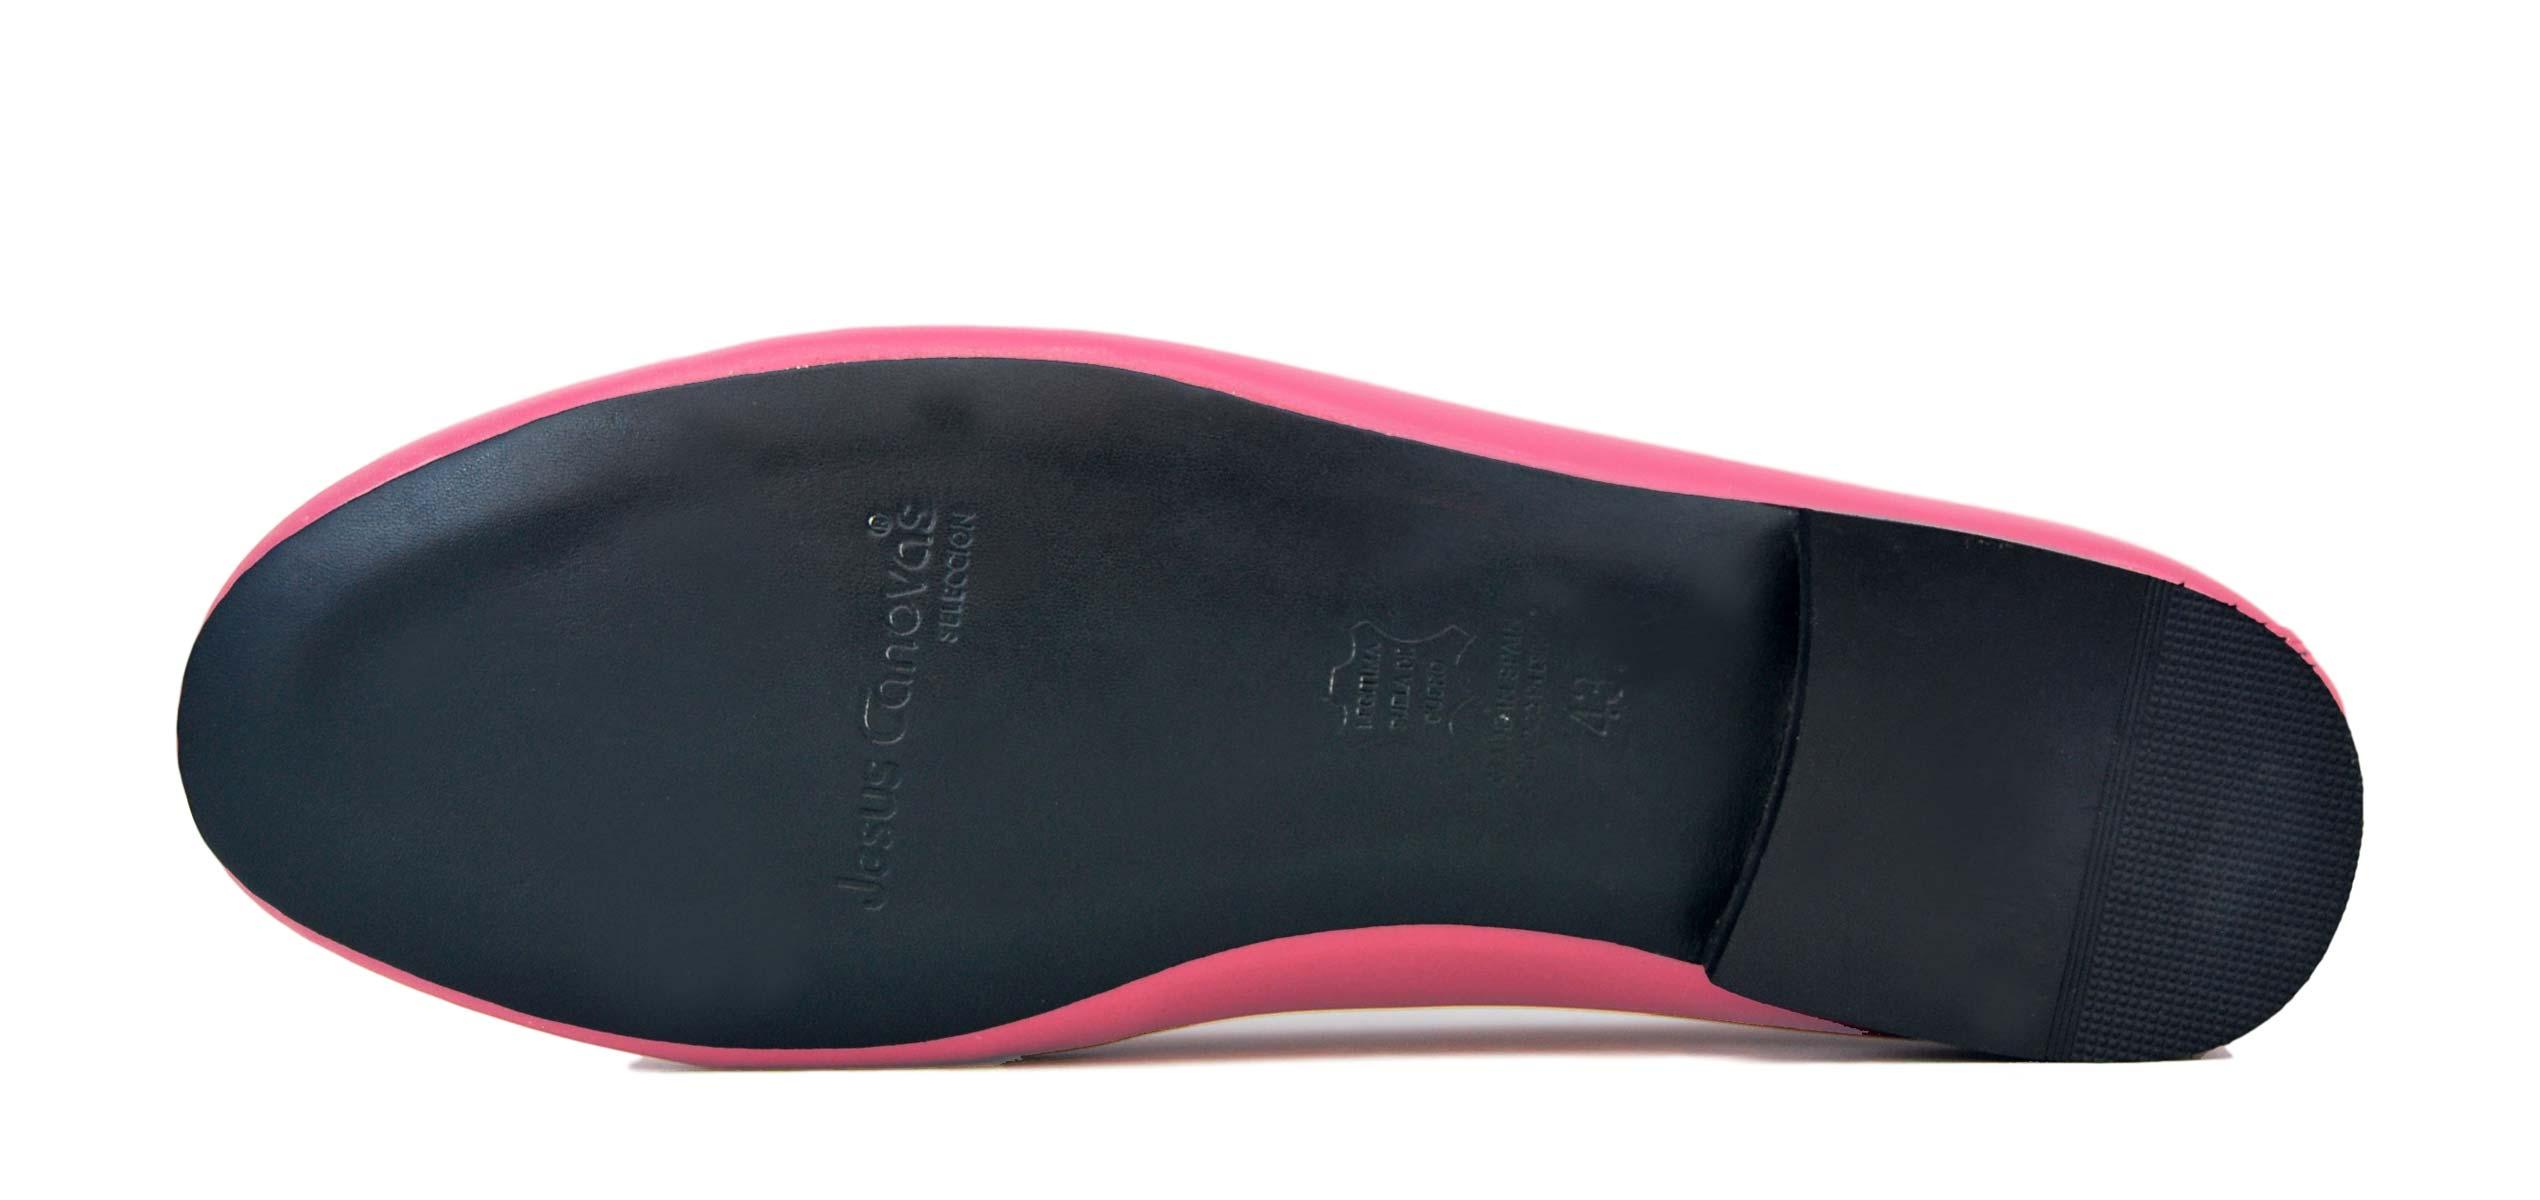 Foto 3 de Zapatos Julio Iglesias 528 JC Sachet Napa